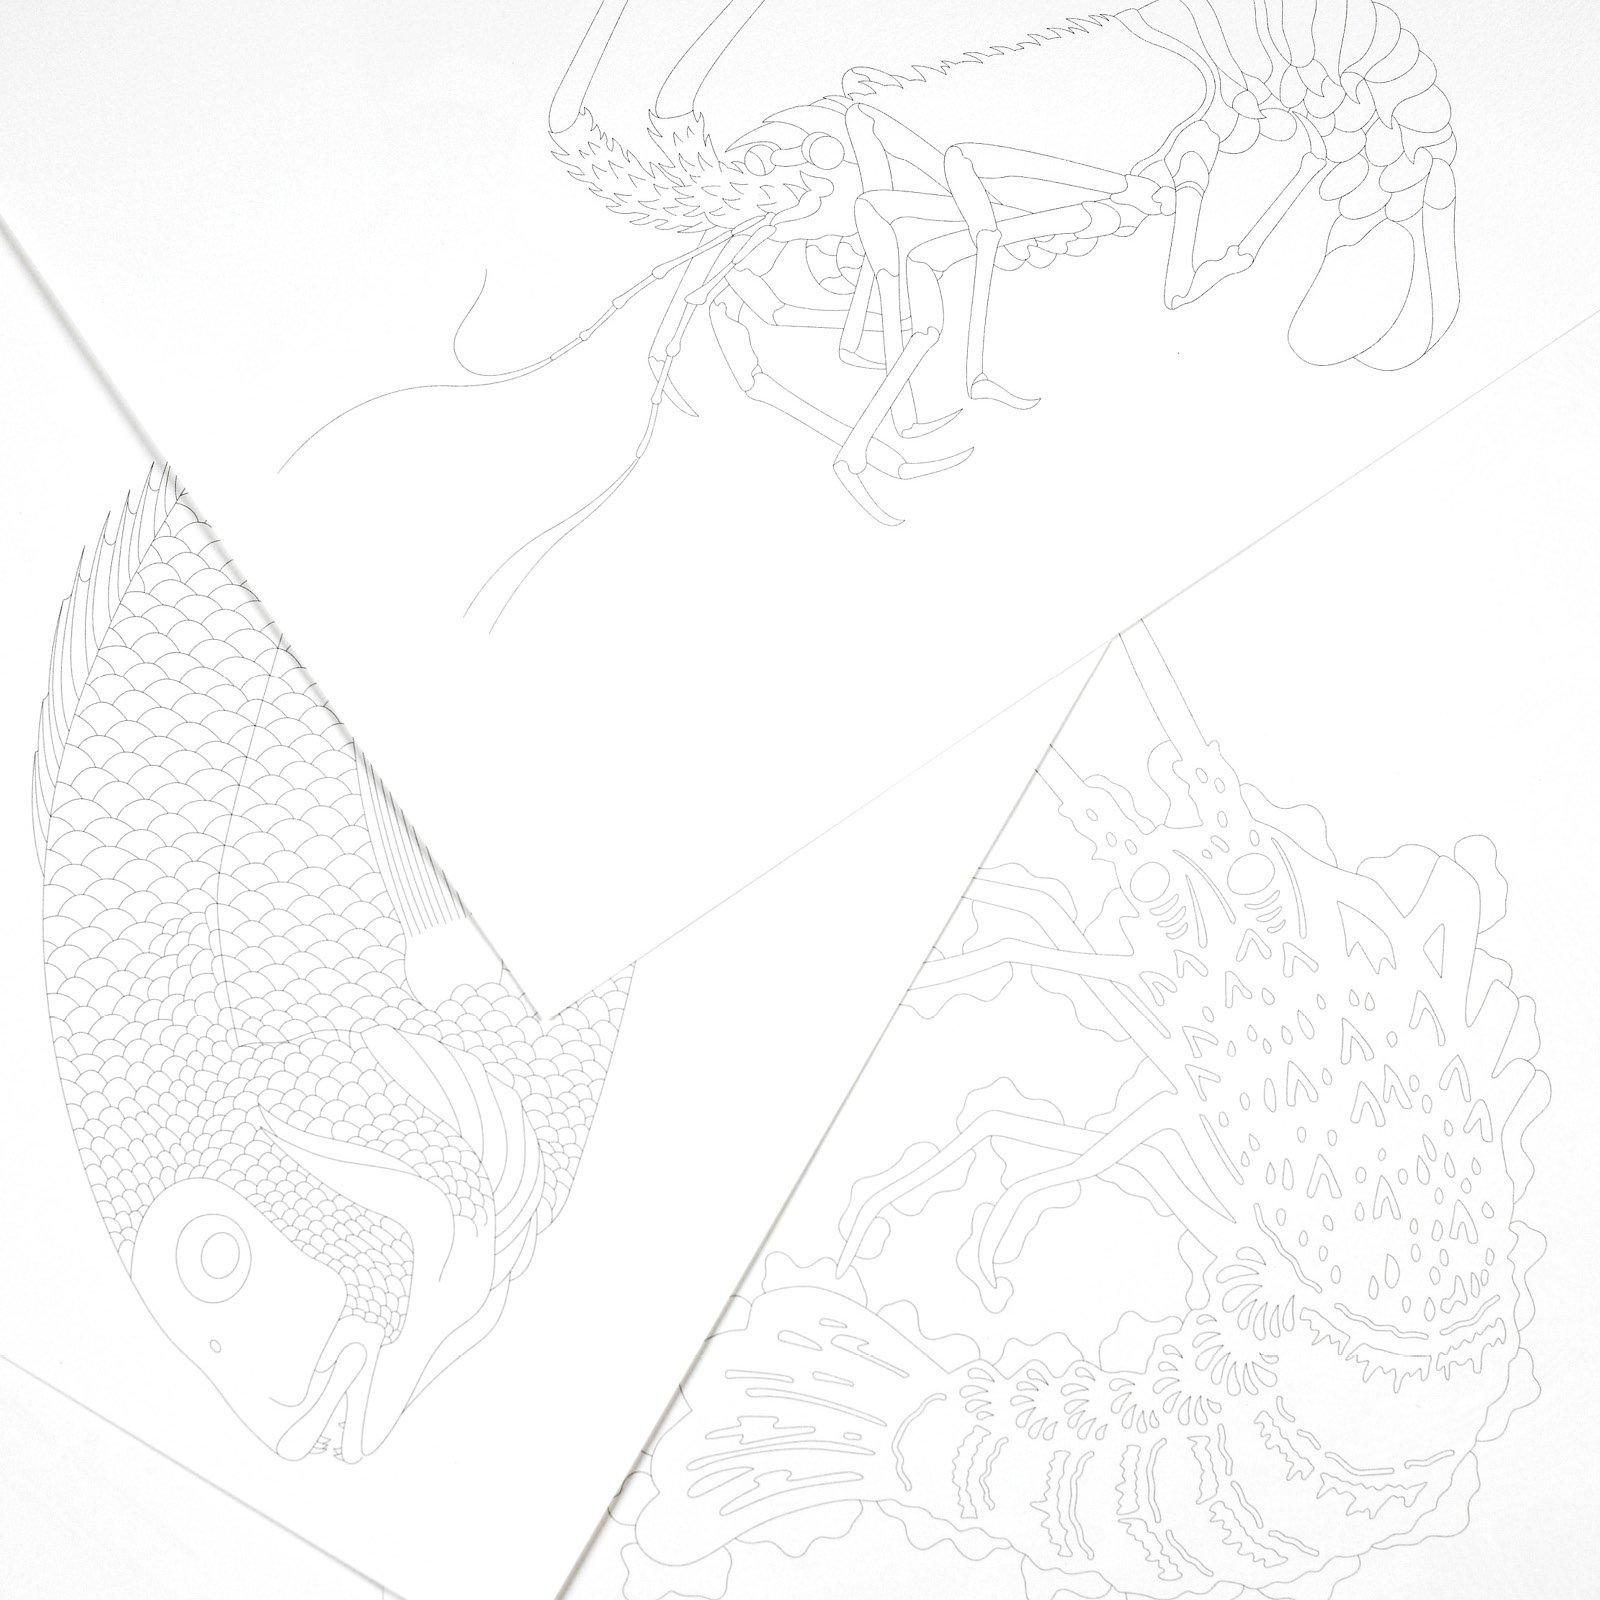 Japanese Designs Artists Colouring Book Books Amazoncouk Pepin Van Roojen 9789460098055